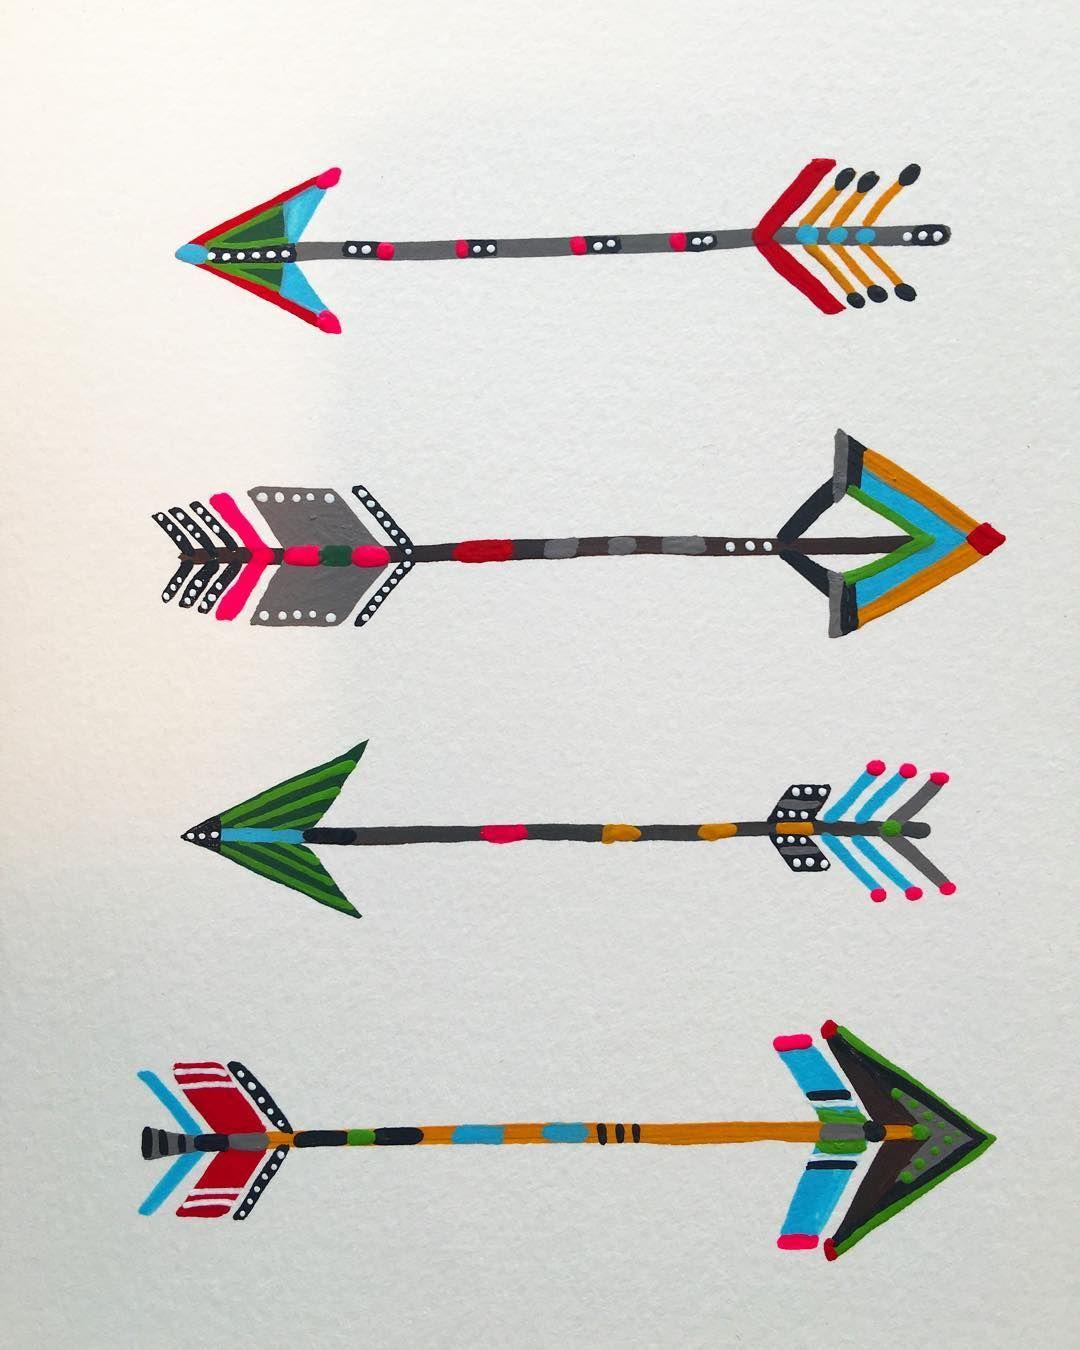 Doodle 56. Goals are deceptive; the unaimed arrow always lands on target. #365anniedoodles